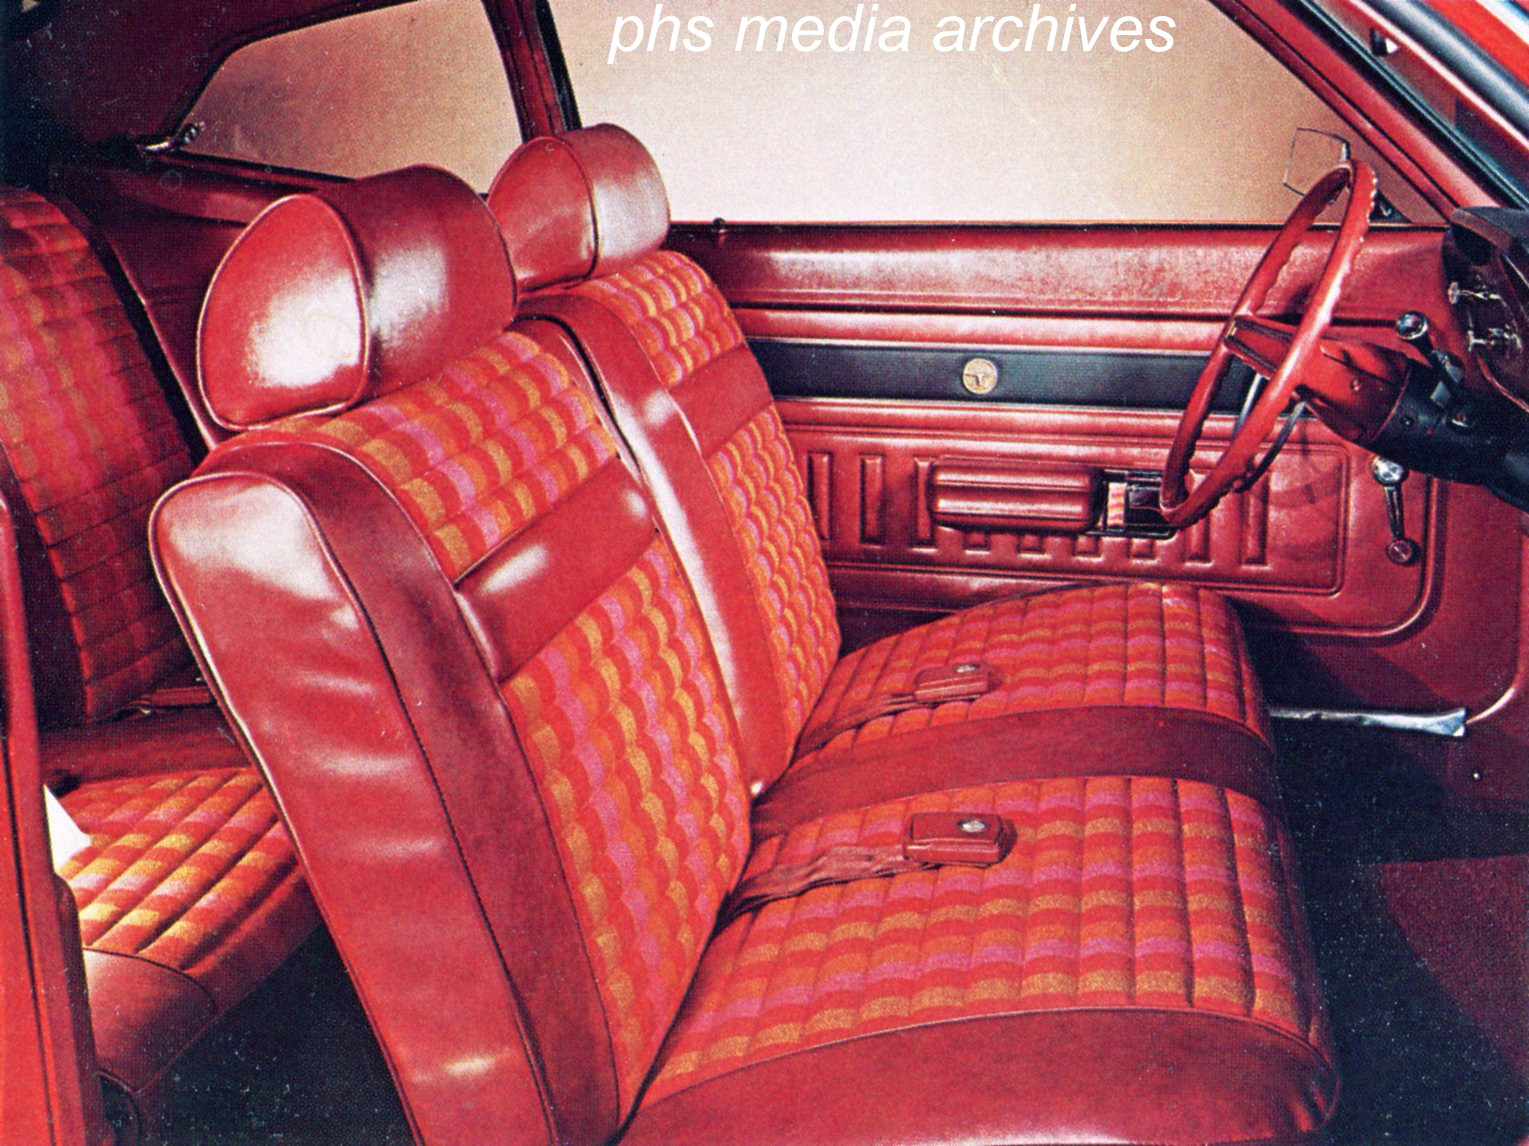 Ford Maverick 1969 1972 Phscollectorcarworld